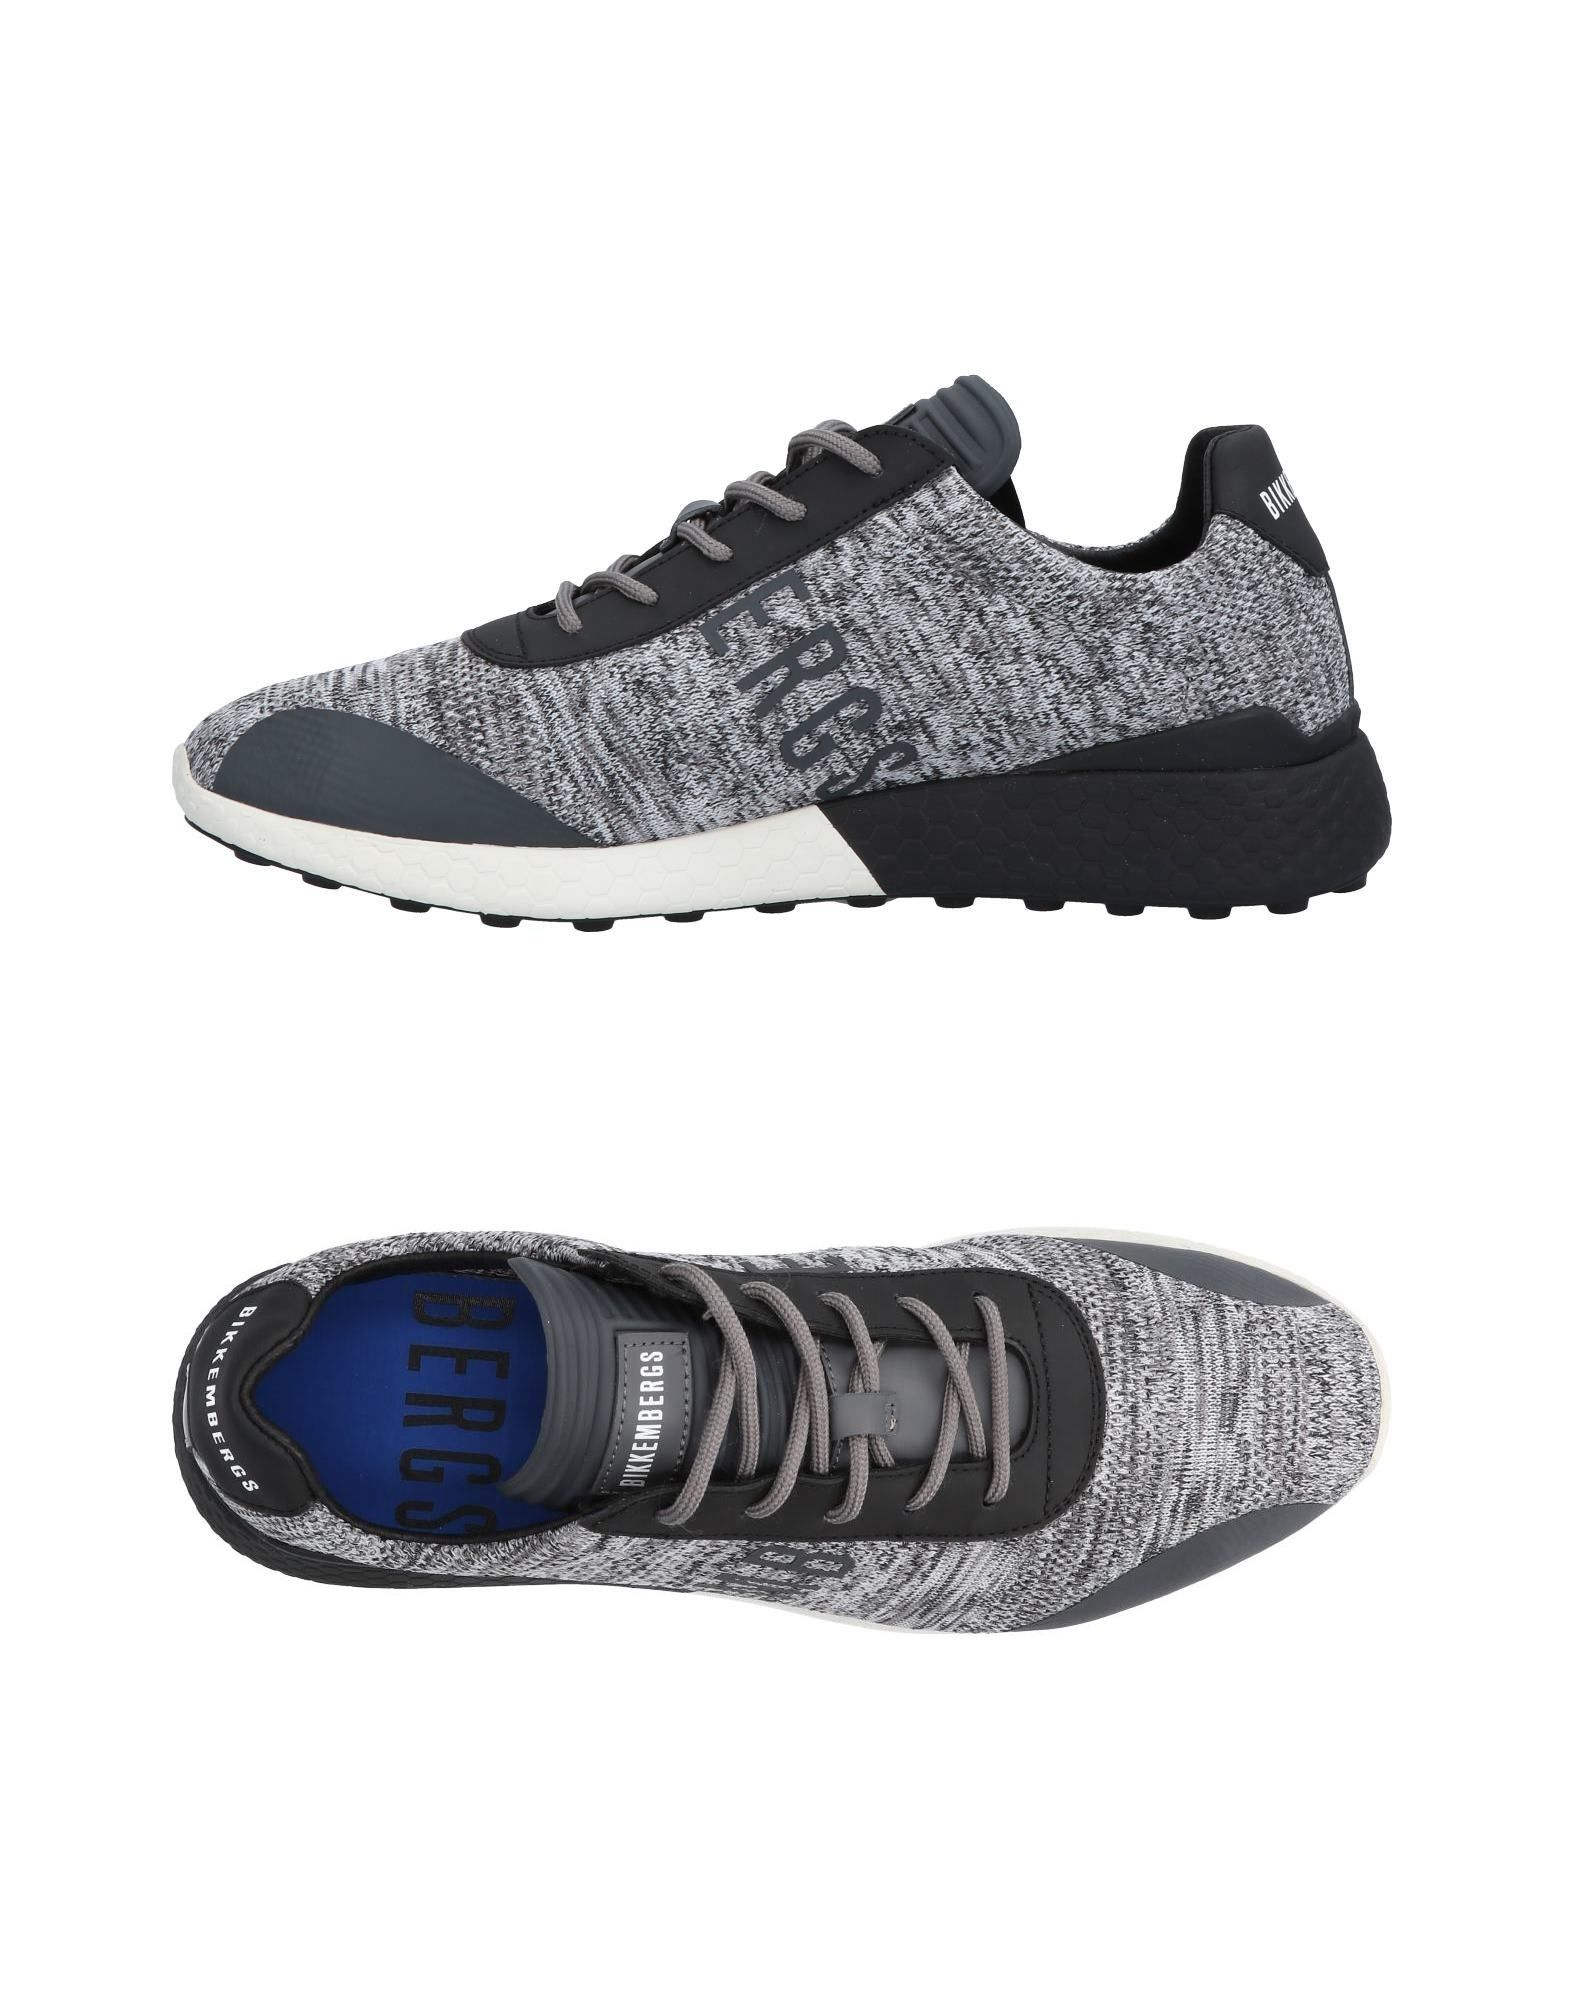 A buon mercato Sneakers Bikkembergs Uomo - 11449878AS